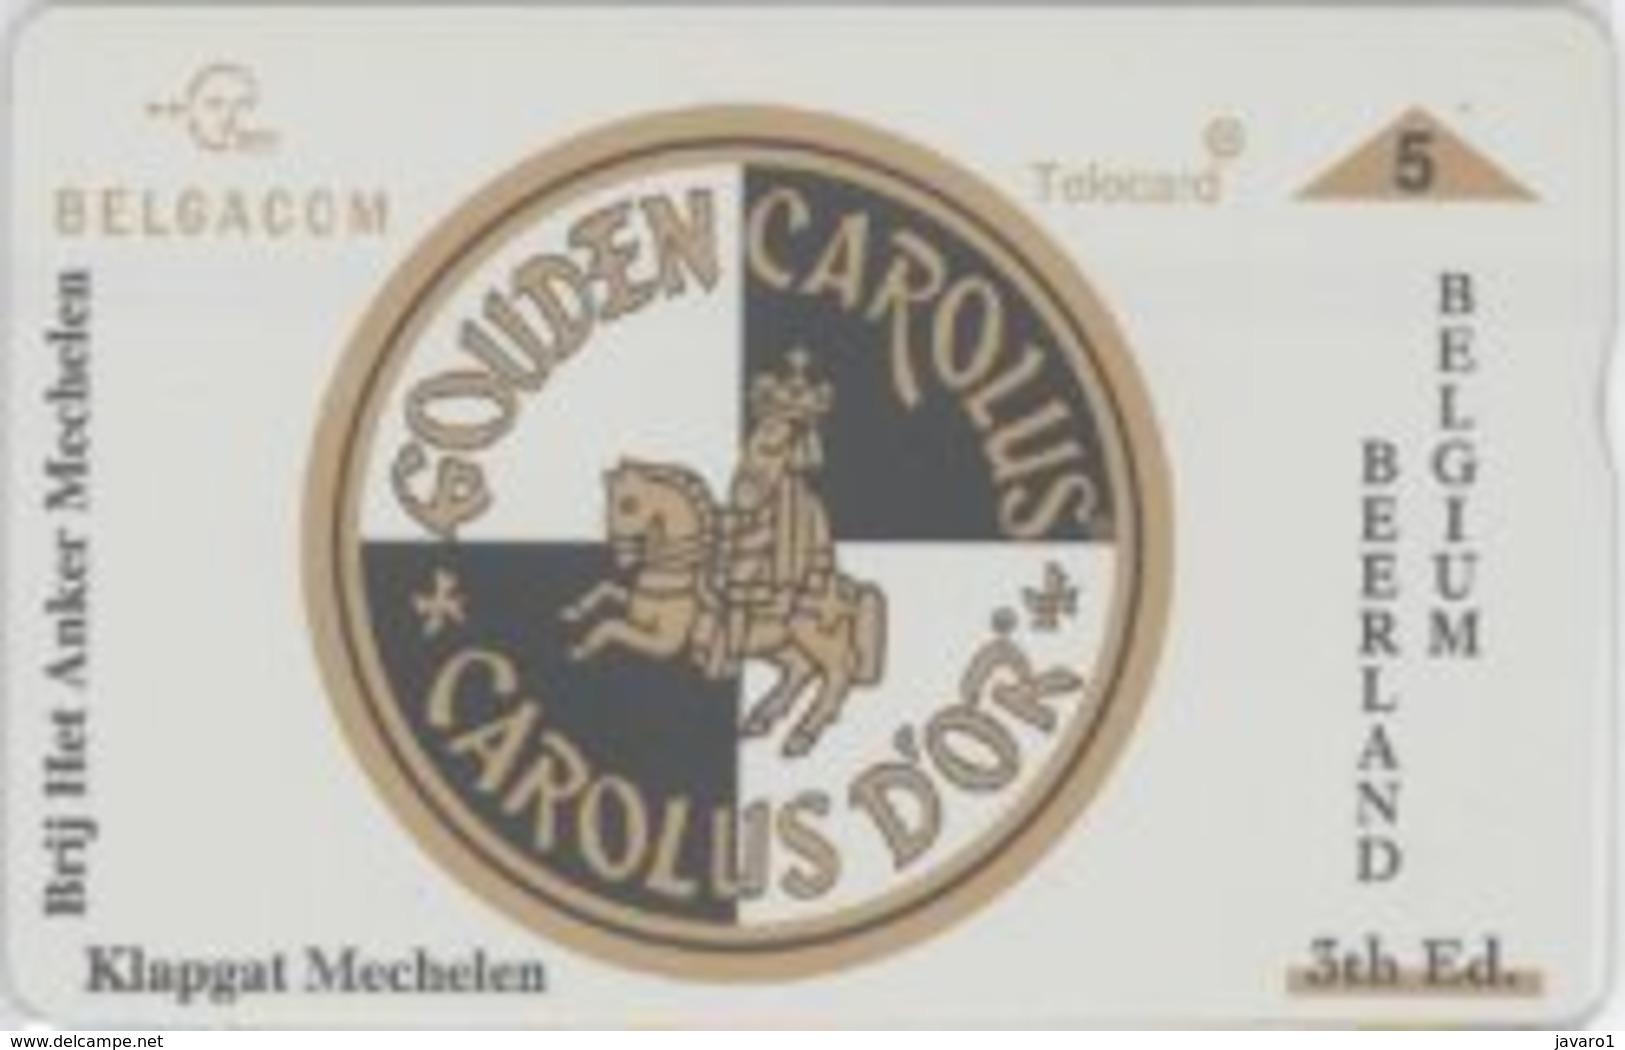 BPR-1996 : P373 5u GOUDEN CAROLUS 3rd ED.(beer) MINT - Belgique